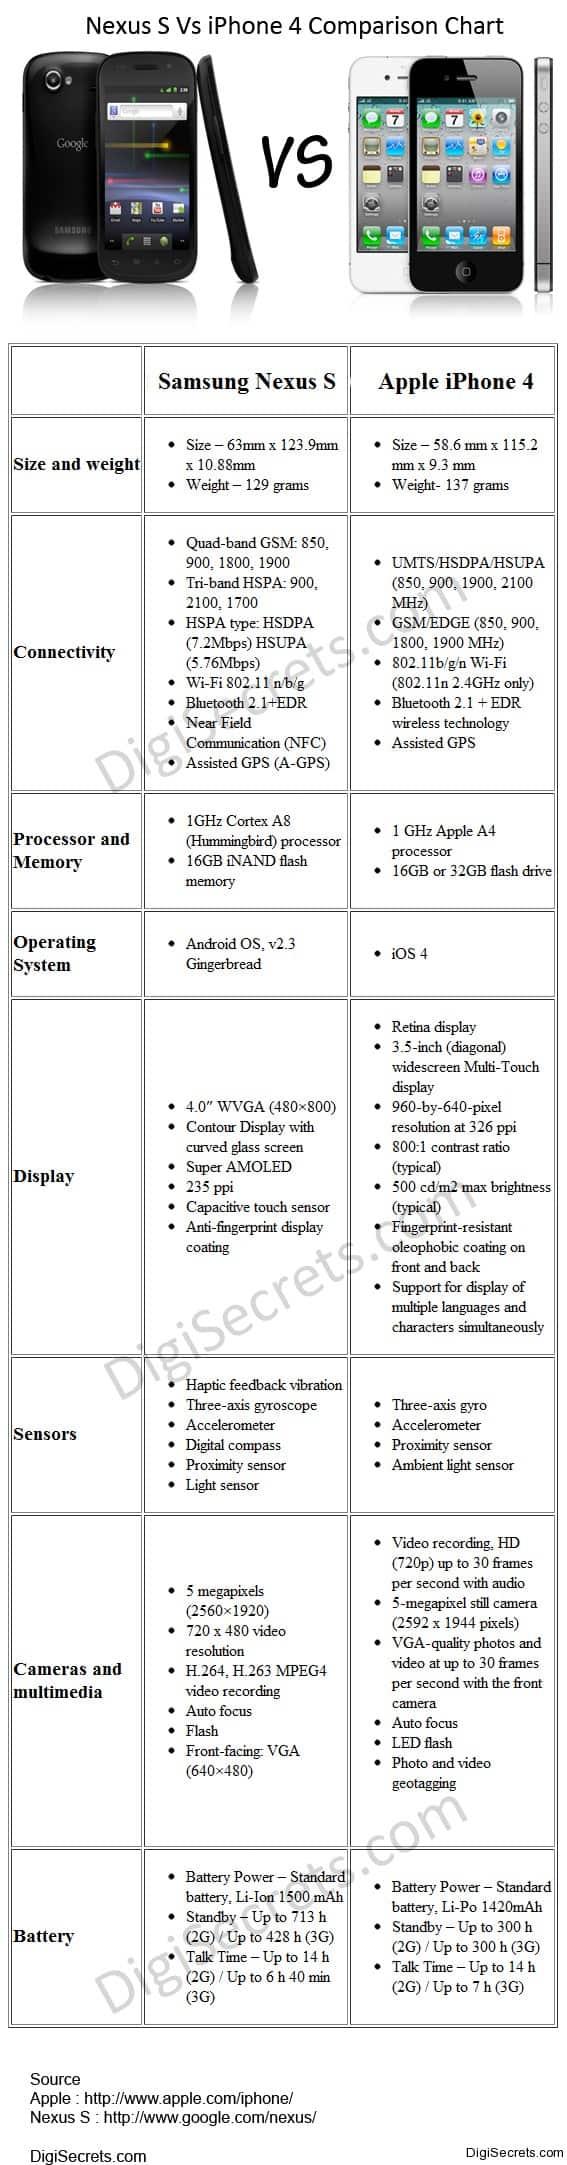 Samsung Google Nexus S Vs iPhone 4 - Comparison